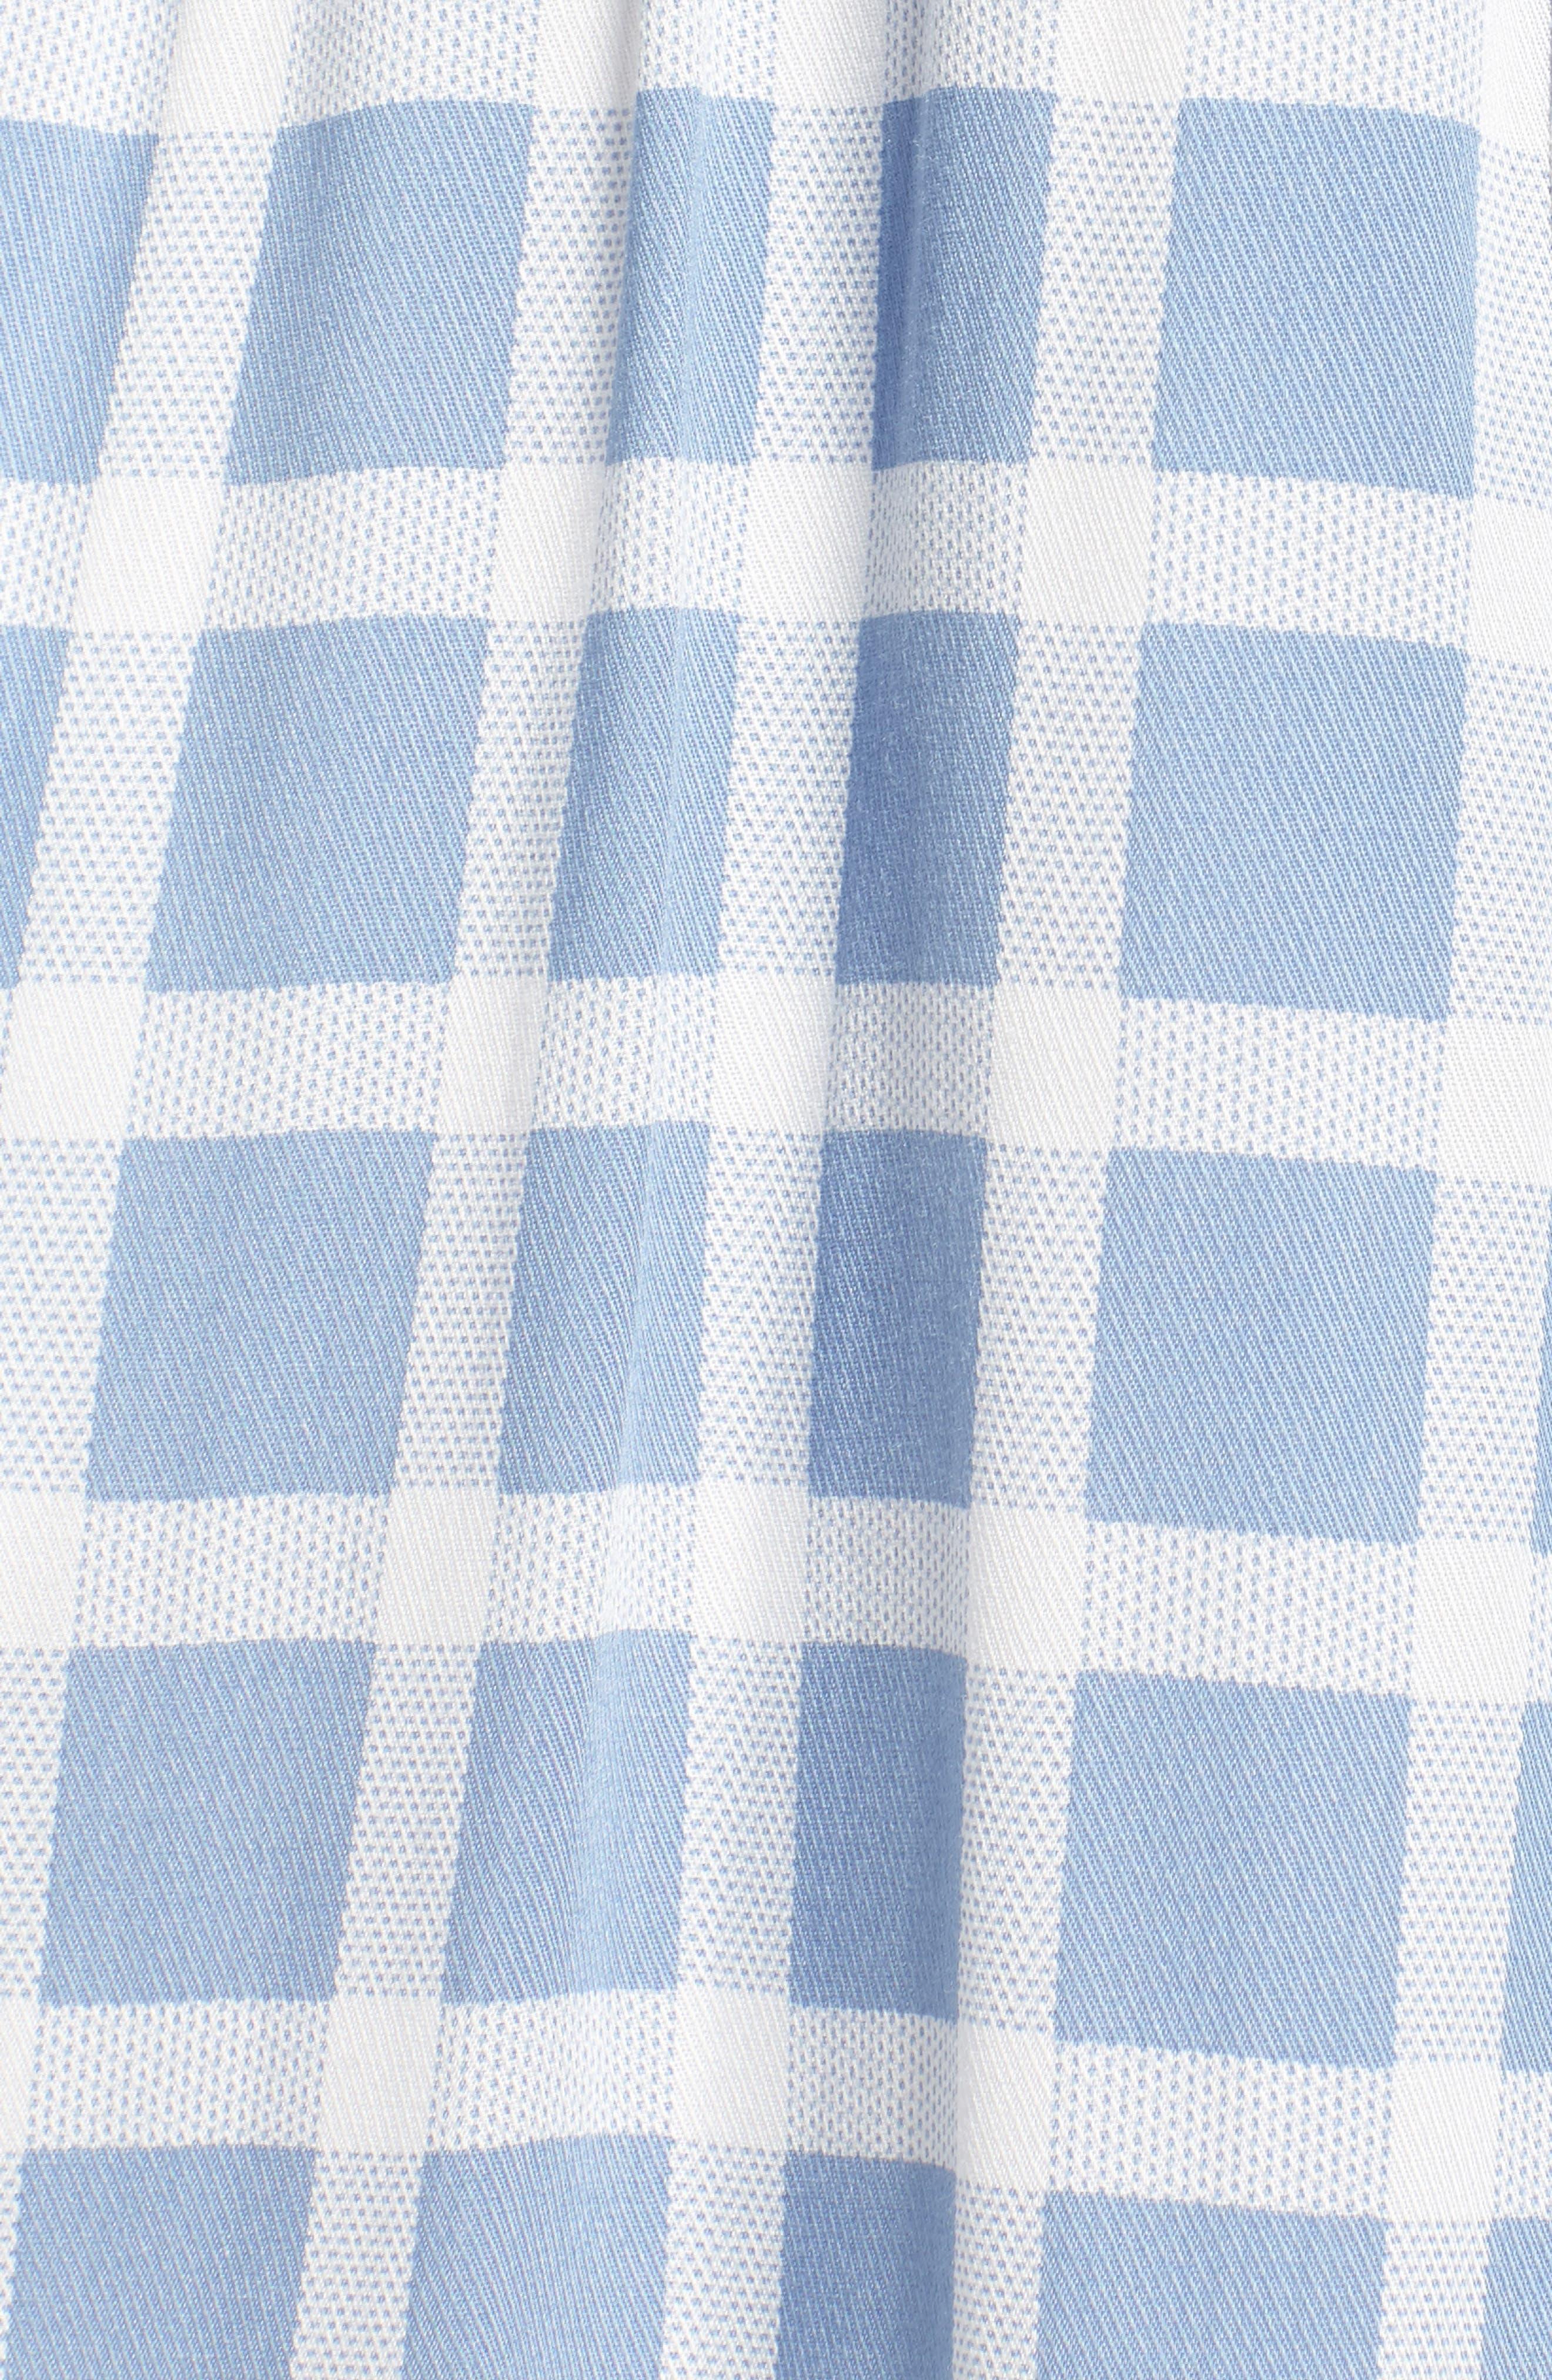 Daniella Plaid Shirtdress,                             Alternate thumbnail 5, color,                             Faded Denim